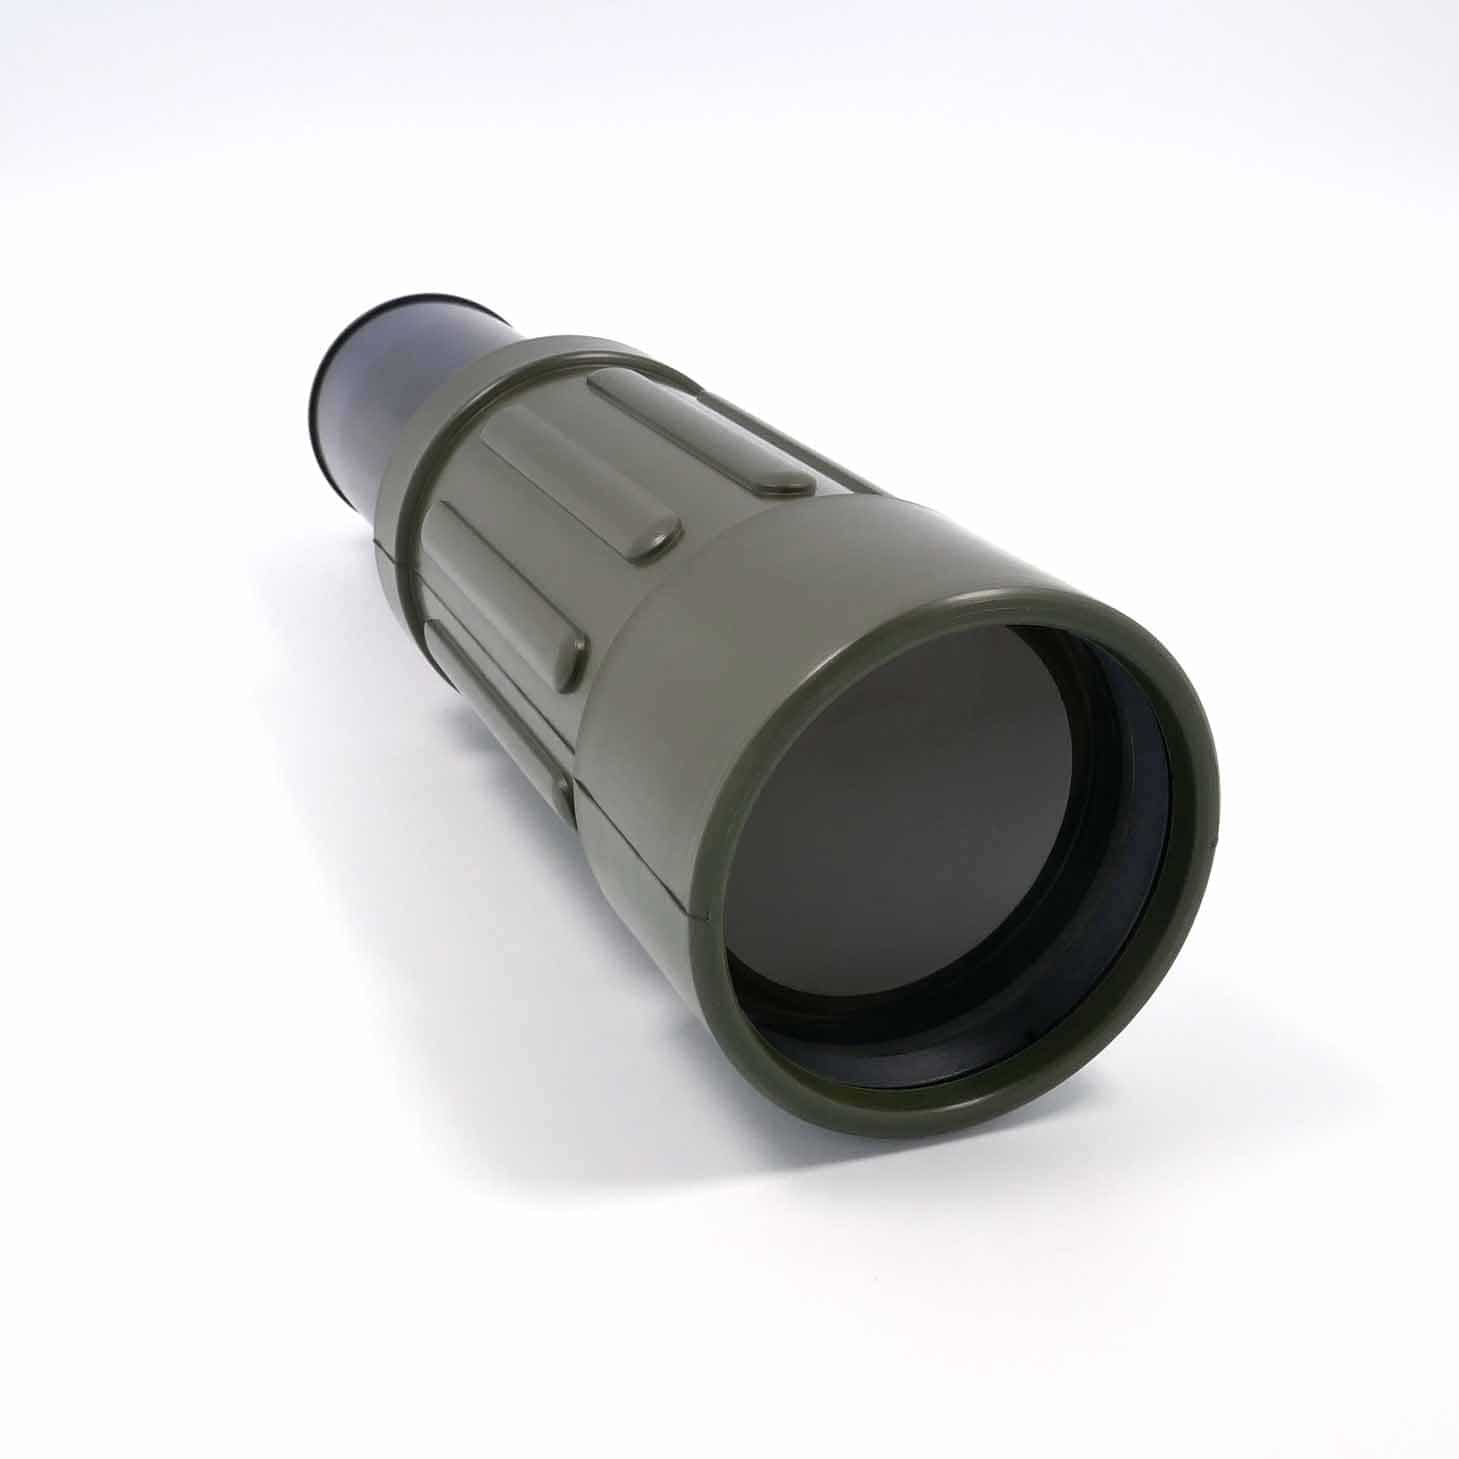 clean-cameras-optolyth-22x70-diflex-04